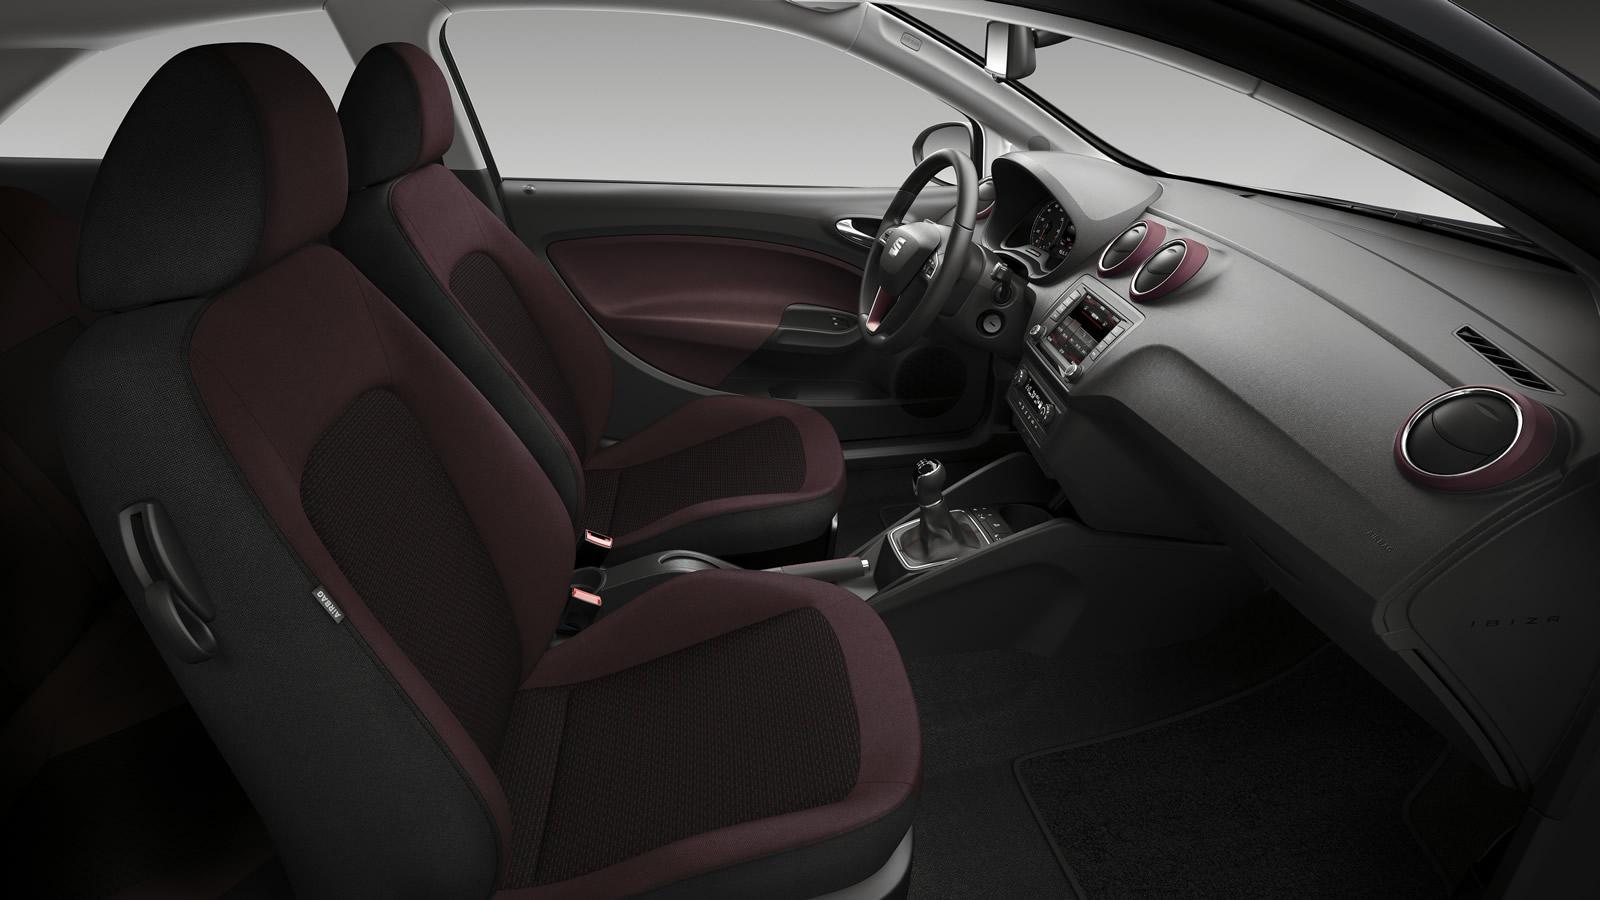 2015 SEAT Ibiza Facelift Gets Leon Interior Bits Minor Cosmetic